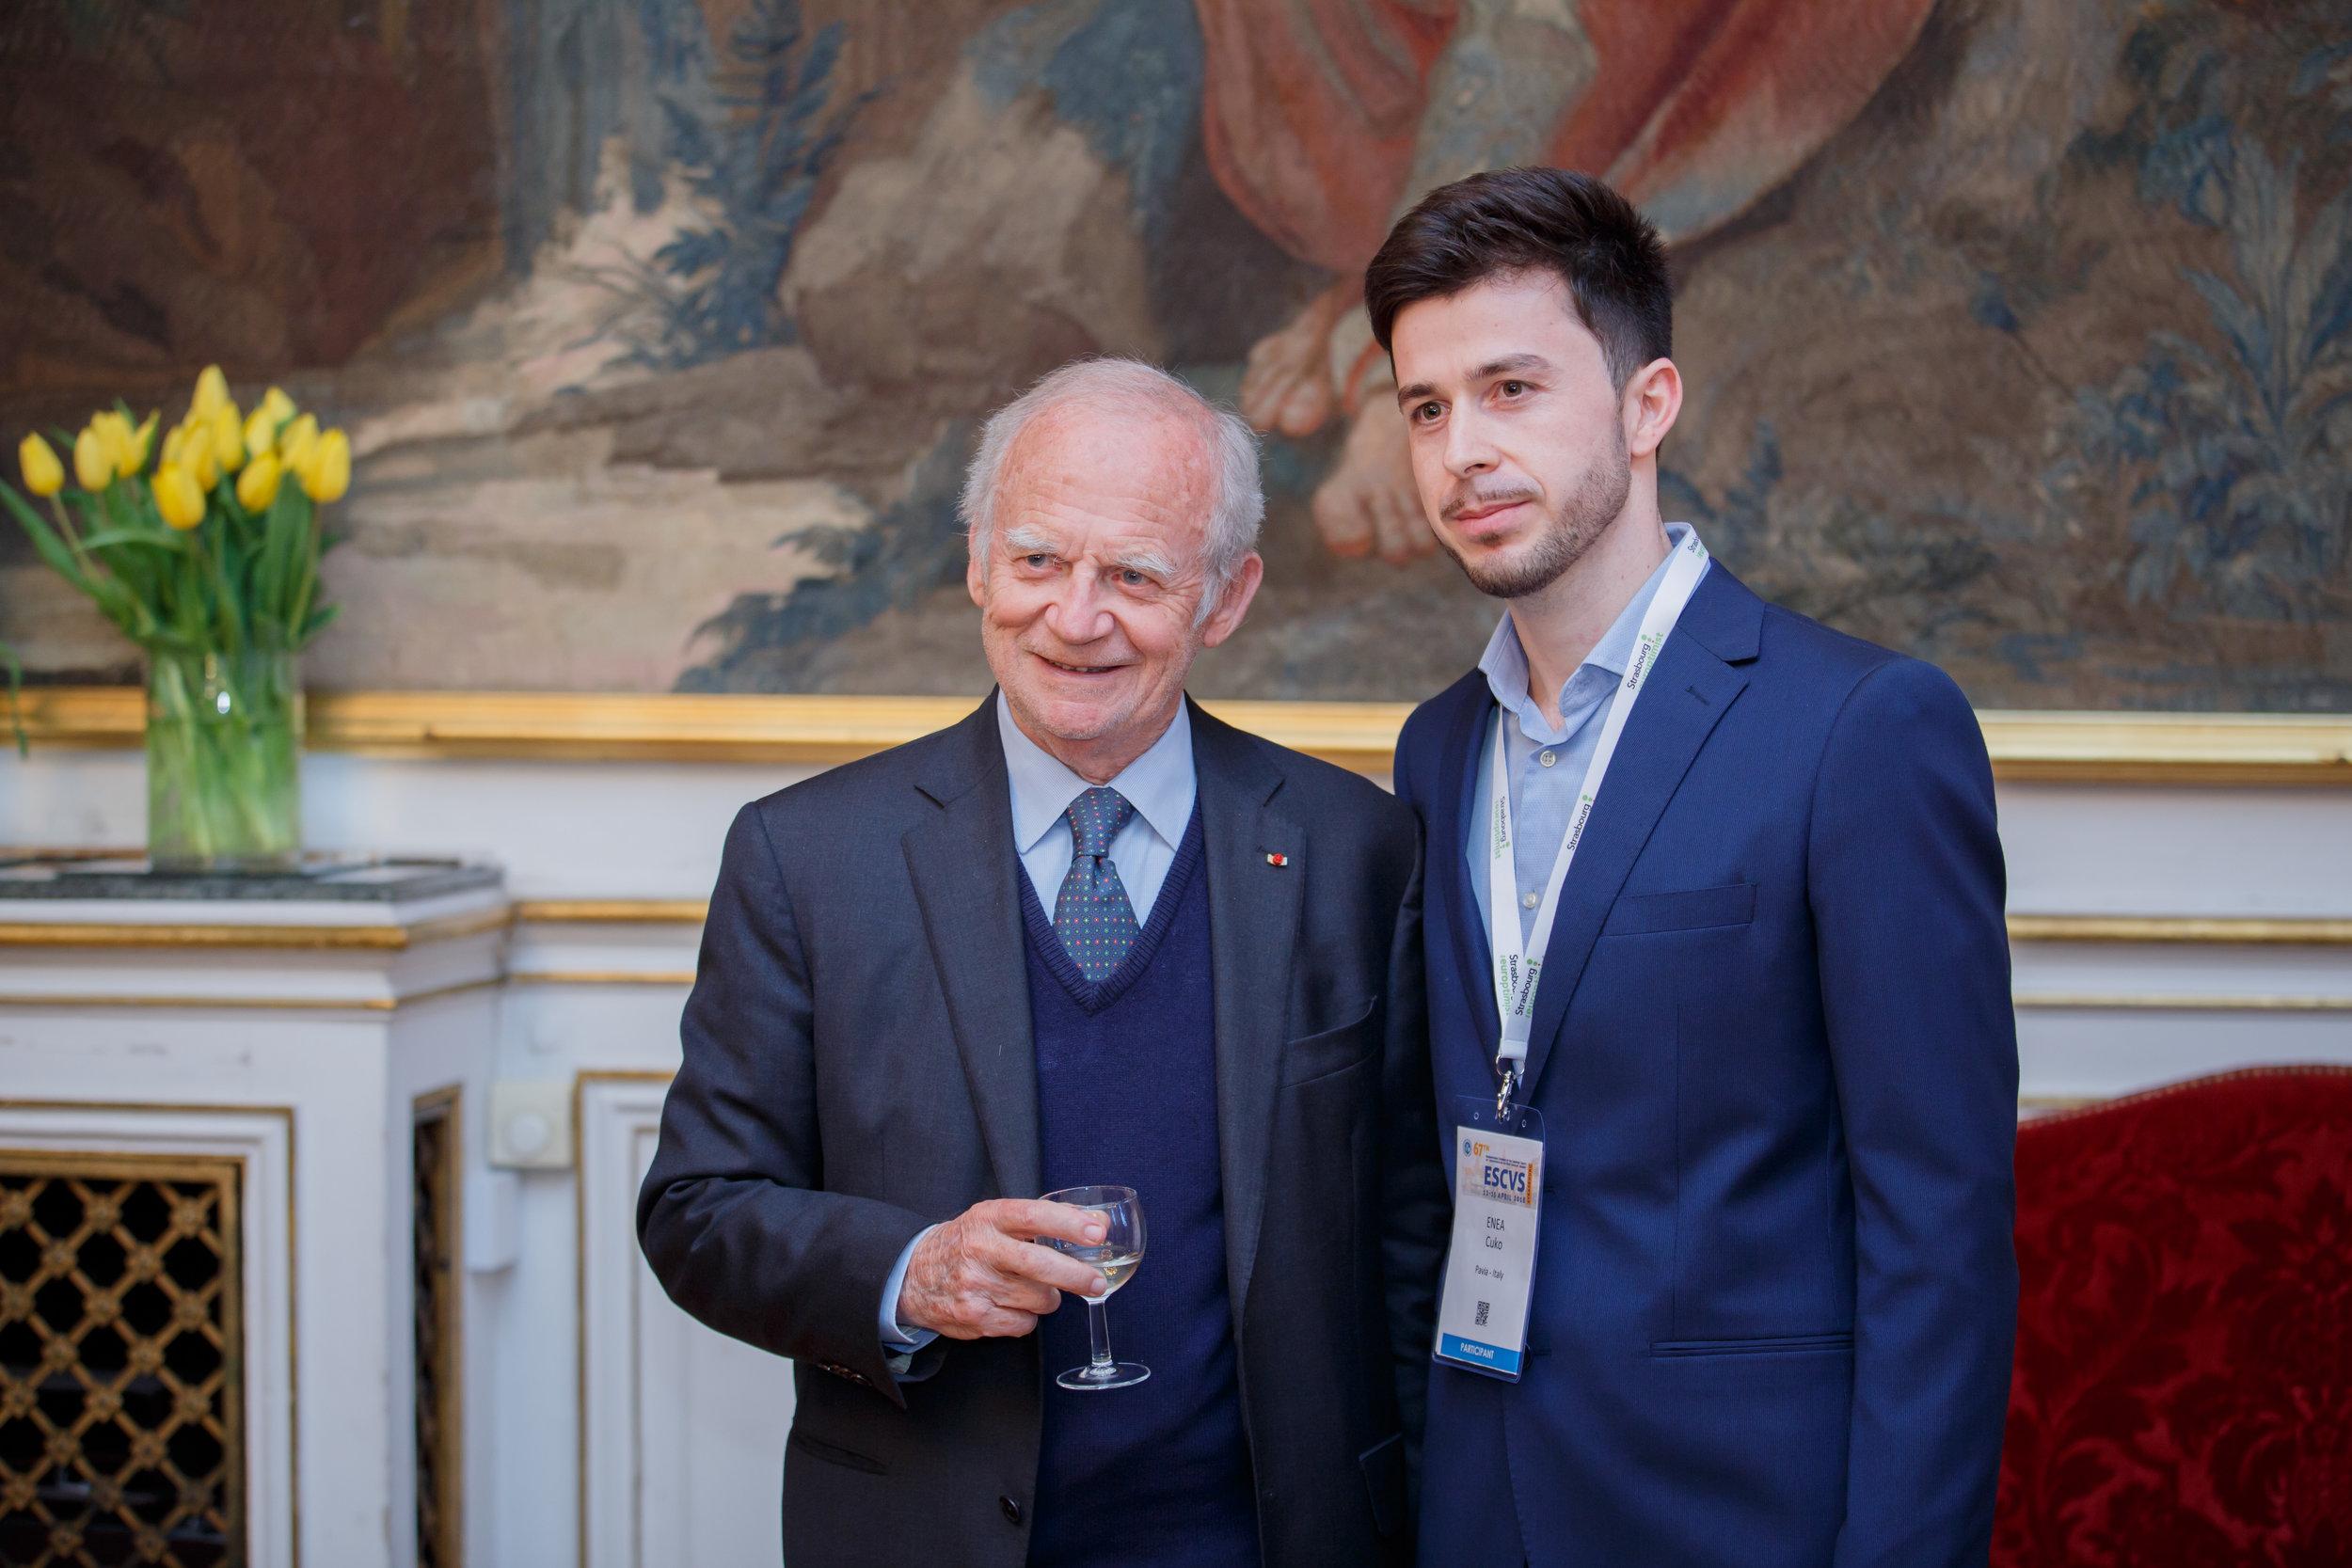 Pr Alain Carpentier, ESCVS 2018 Inauguration Dinner